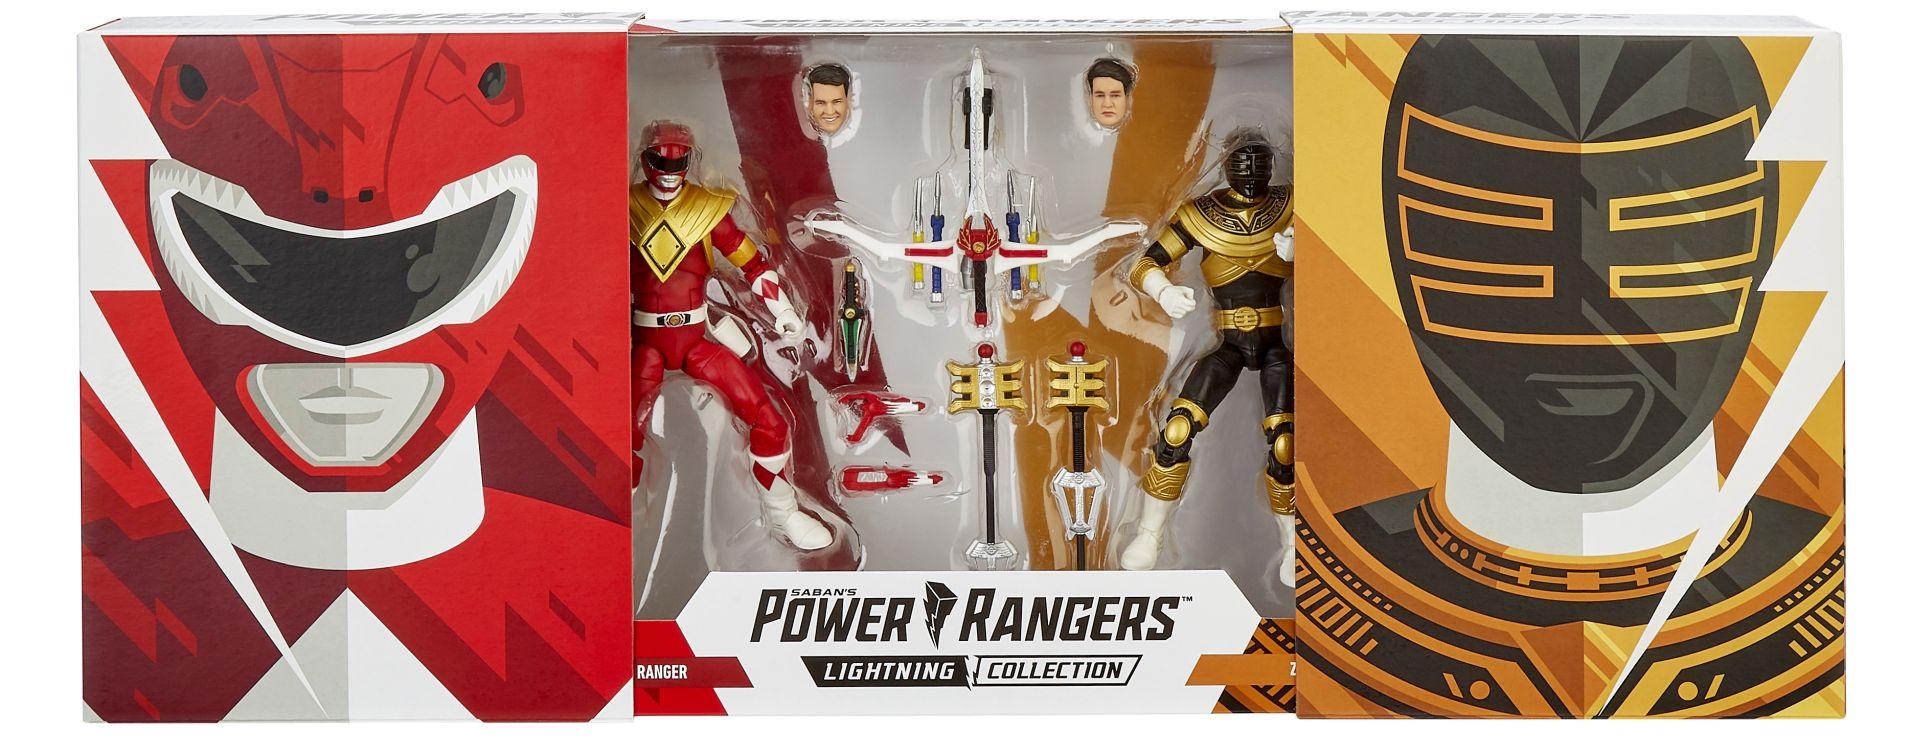 POWER RANGERS Lightning Figures as Comic-Con